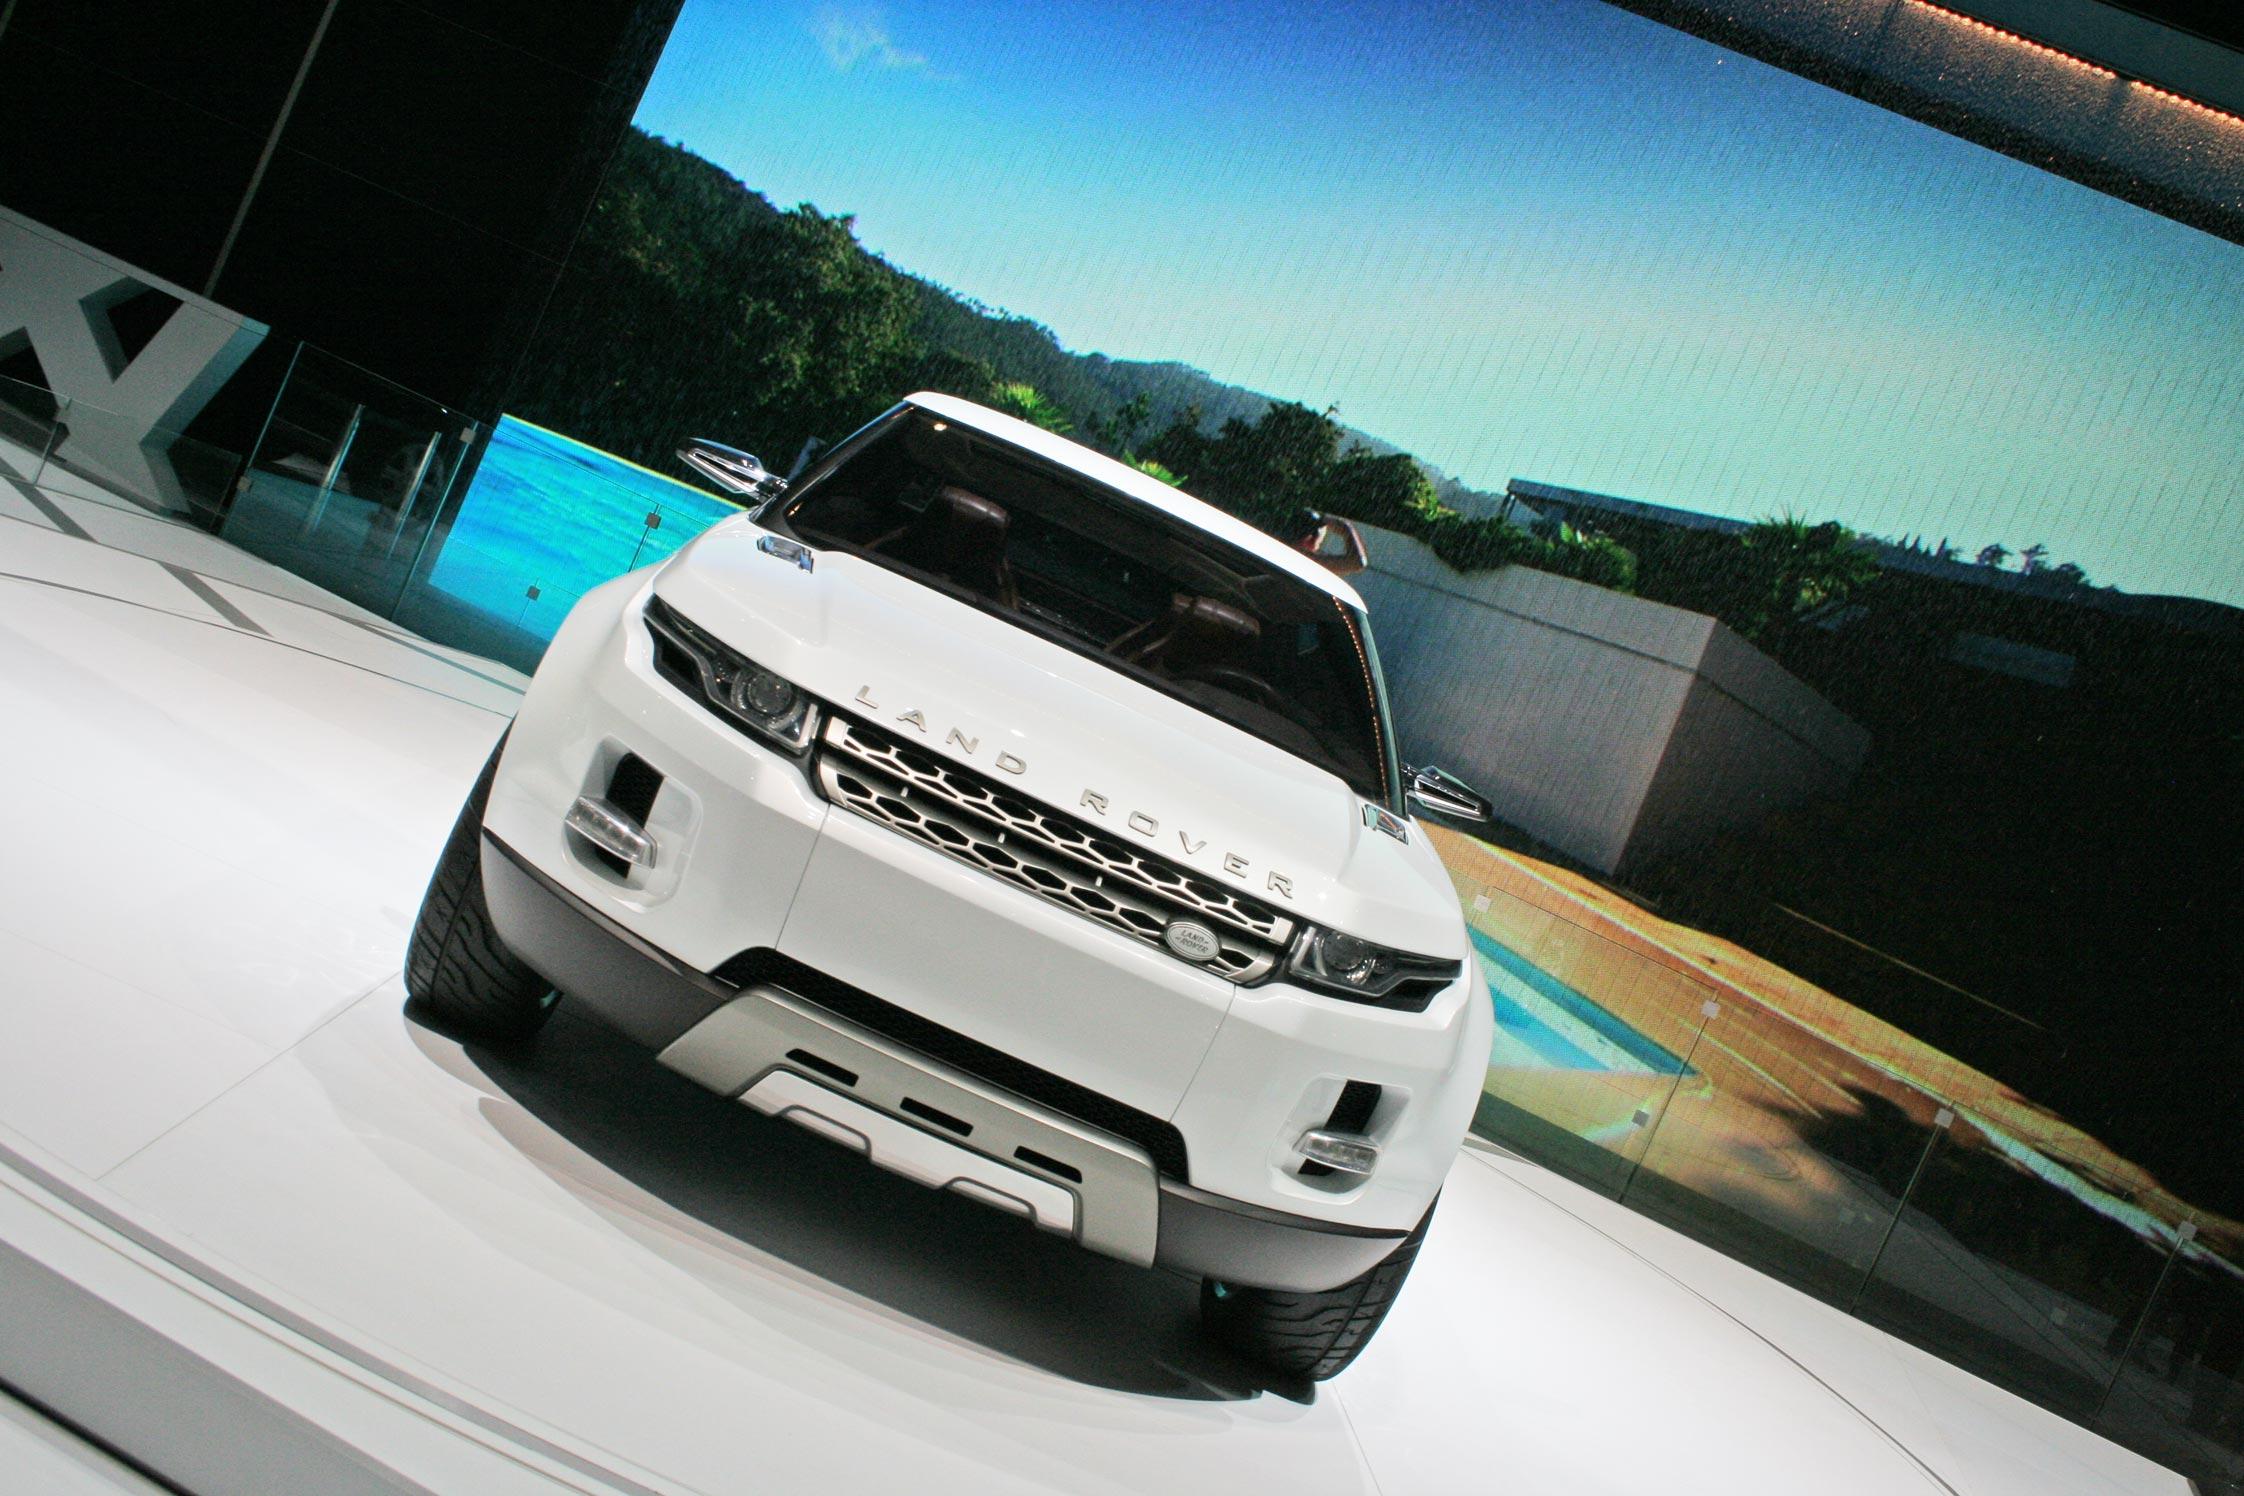 http://www.motorlegend.com/images-voiture/hd/land-rover-lrx-concept-46158.jpg